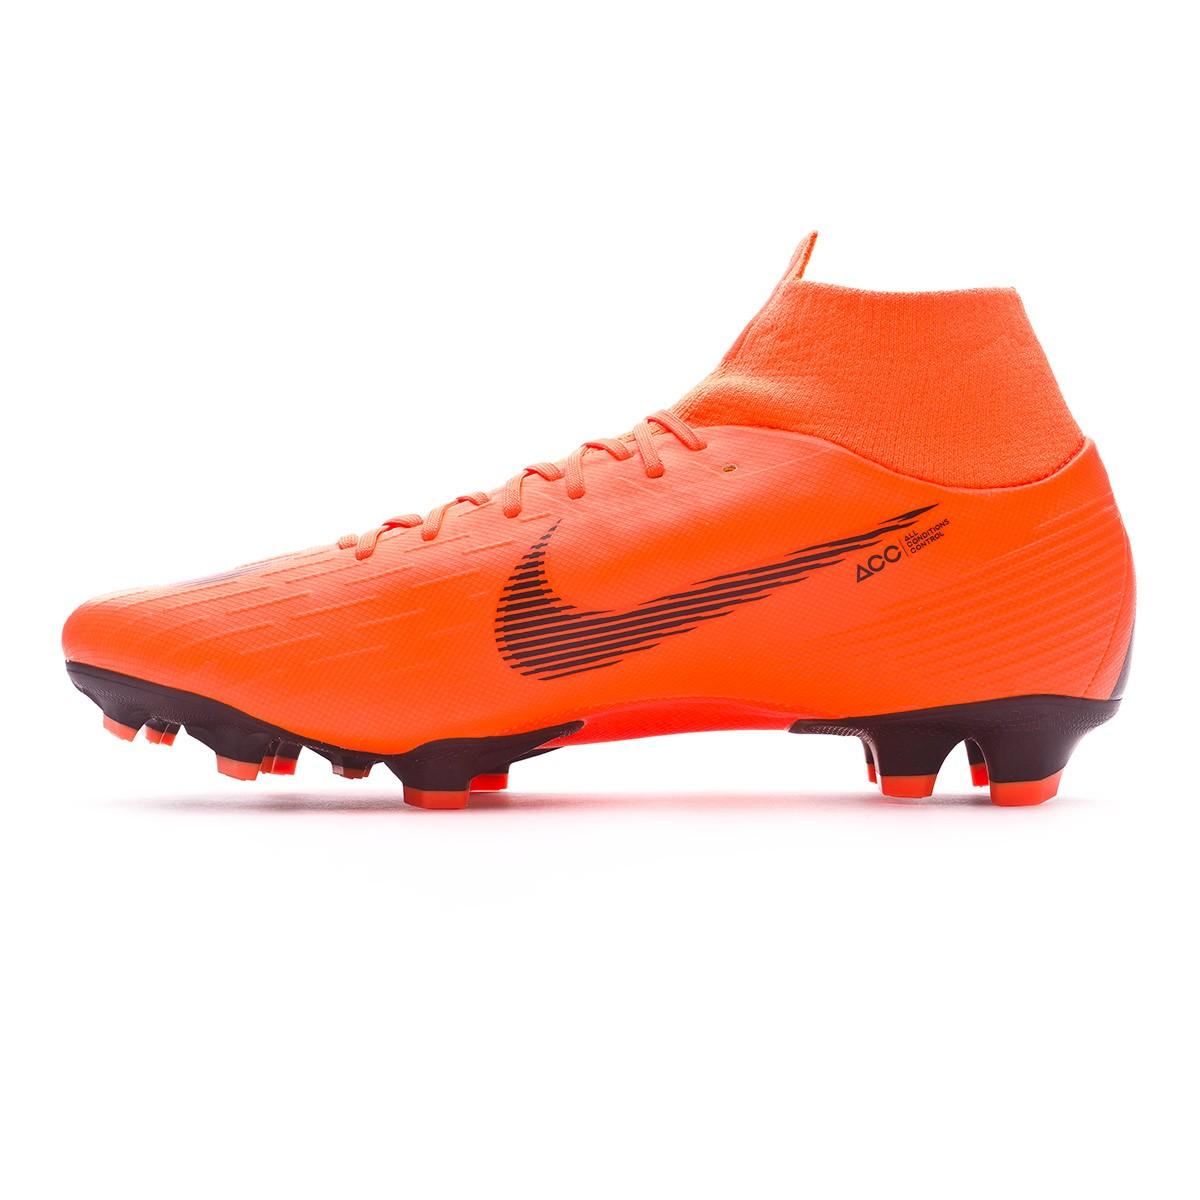 a73ff83e2aa2 Football Boots Nike Mercurial Superfly VI Pro FG Total orange-Black-Volt -  Tienda de fútbol Fútbol Emotion